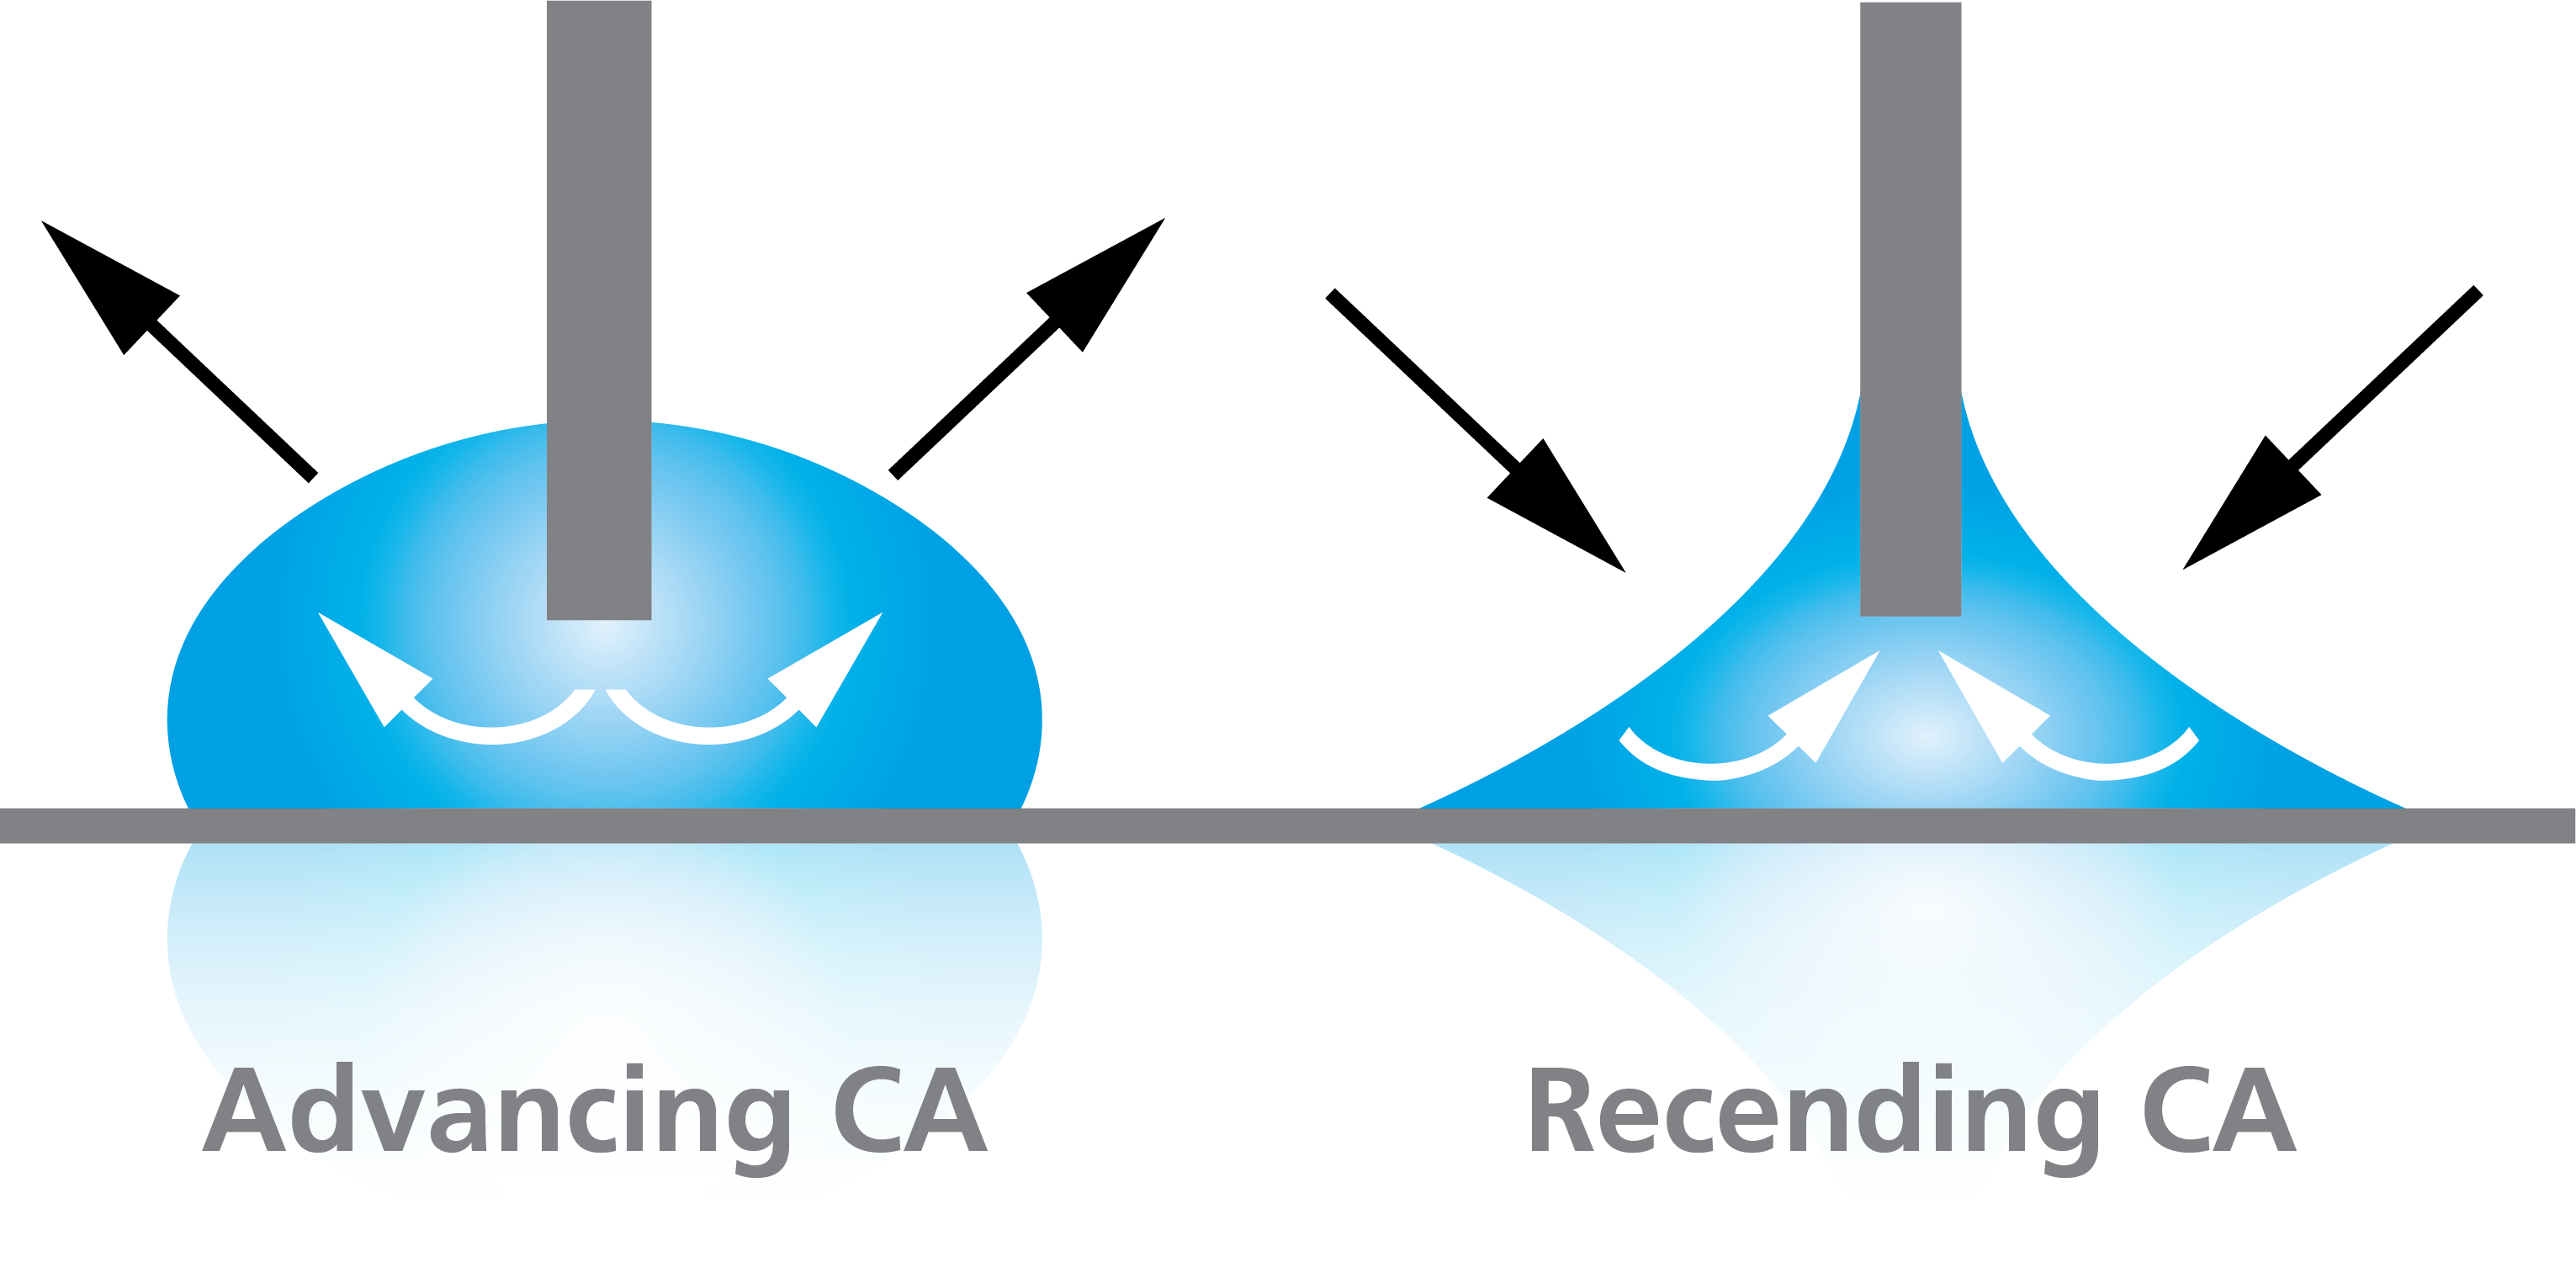 Advancing and receding angle with needle method